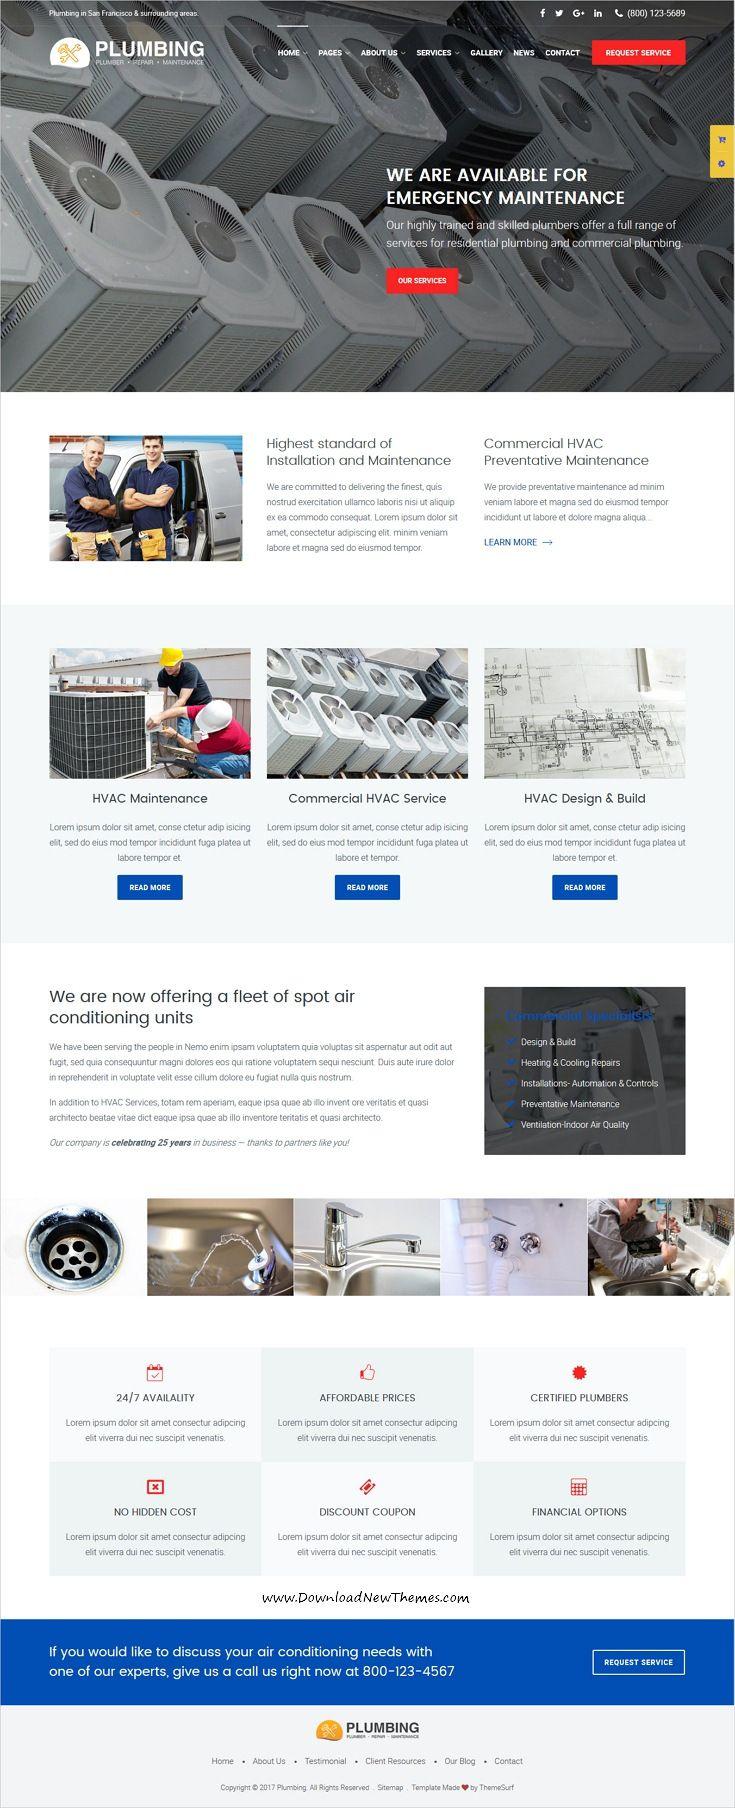 Plumbing Plumber And Repair Services Maintenance Html Template Hvac Design Web Design Tips Plumbing